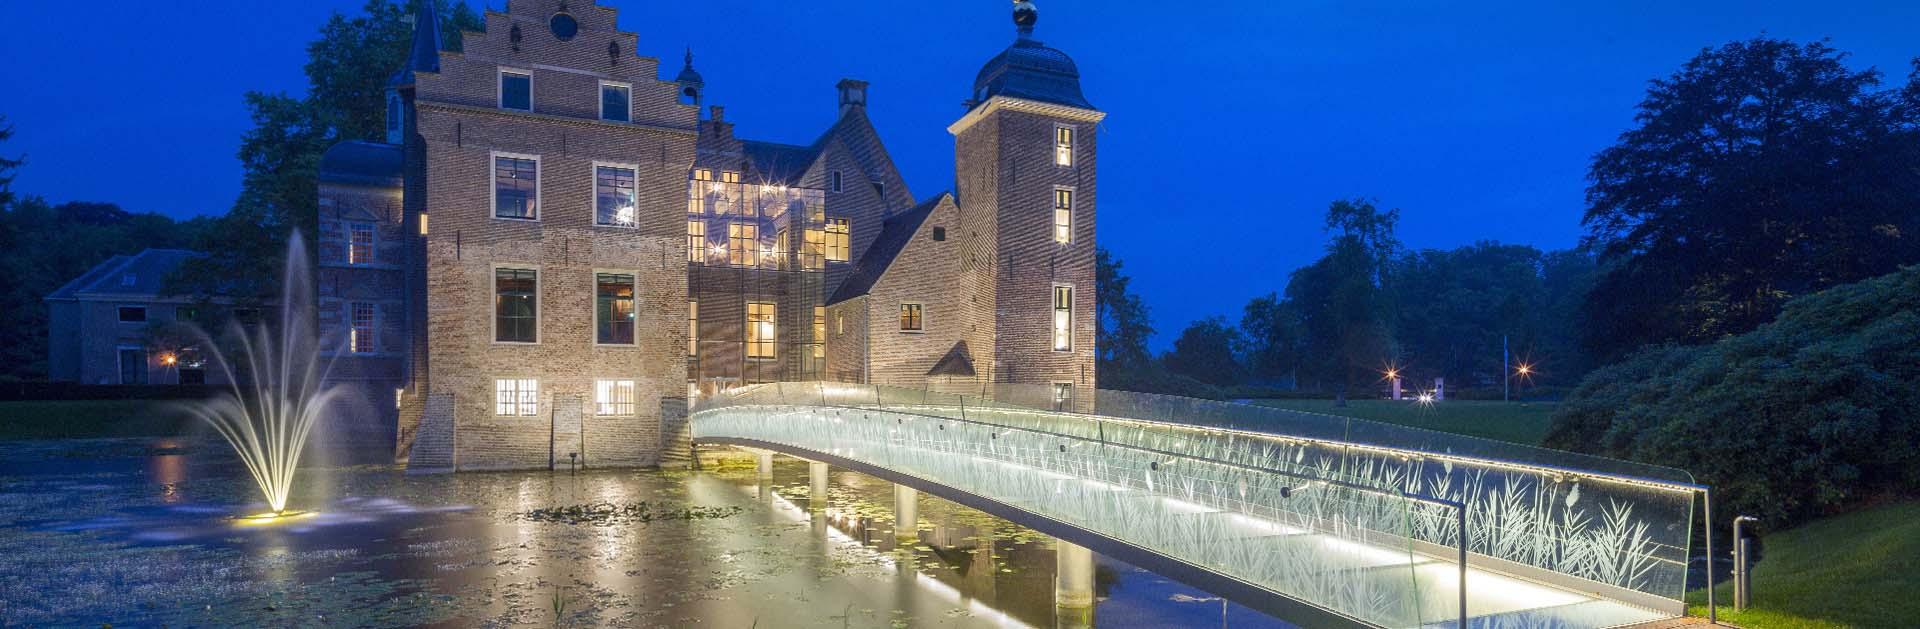 Museum MORE | Kasteel Ruurlo - Ruurlo Regio Achterhoek - Liemers